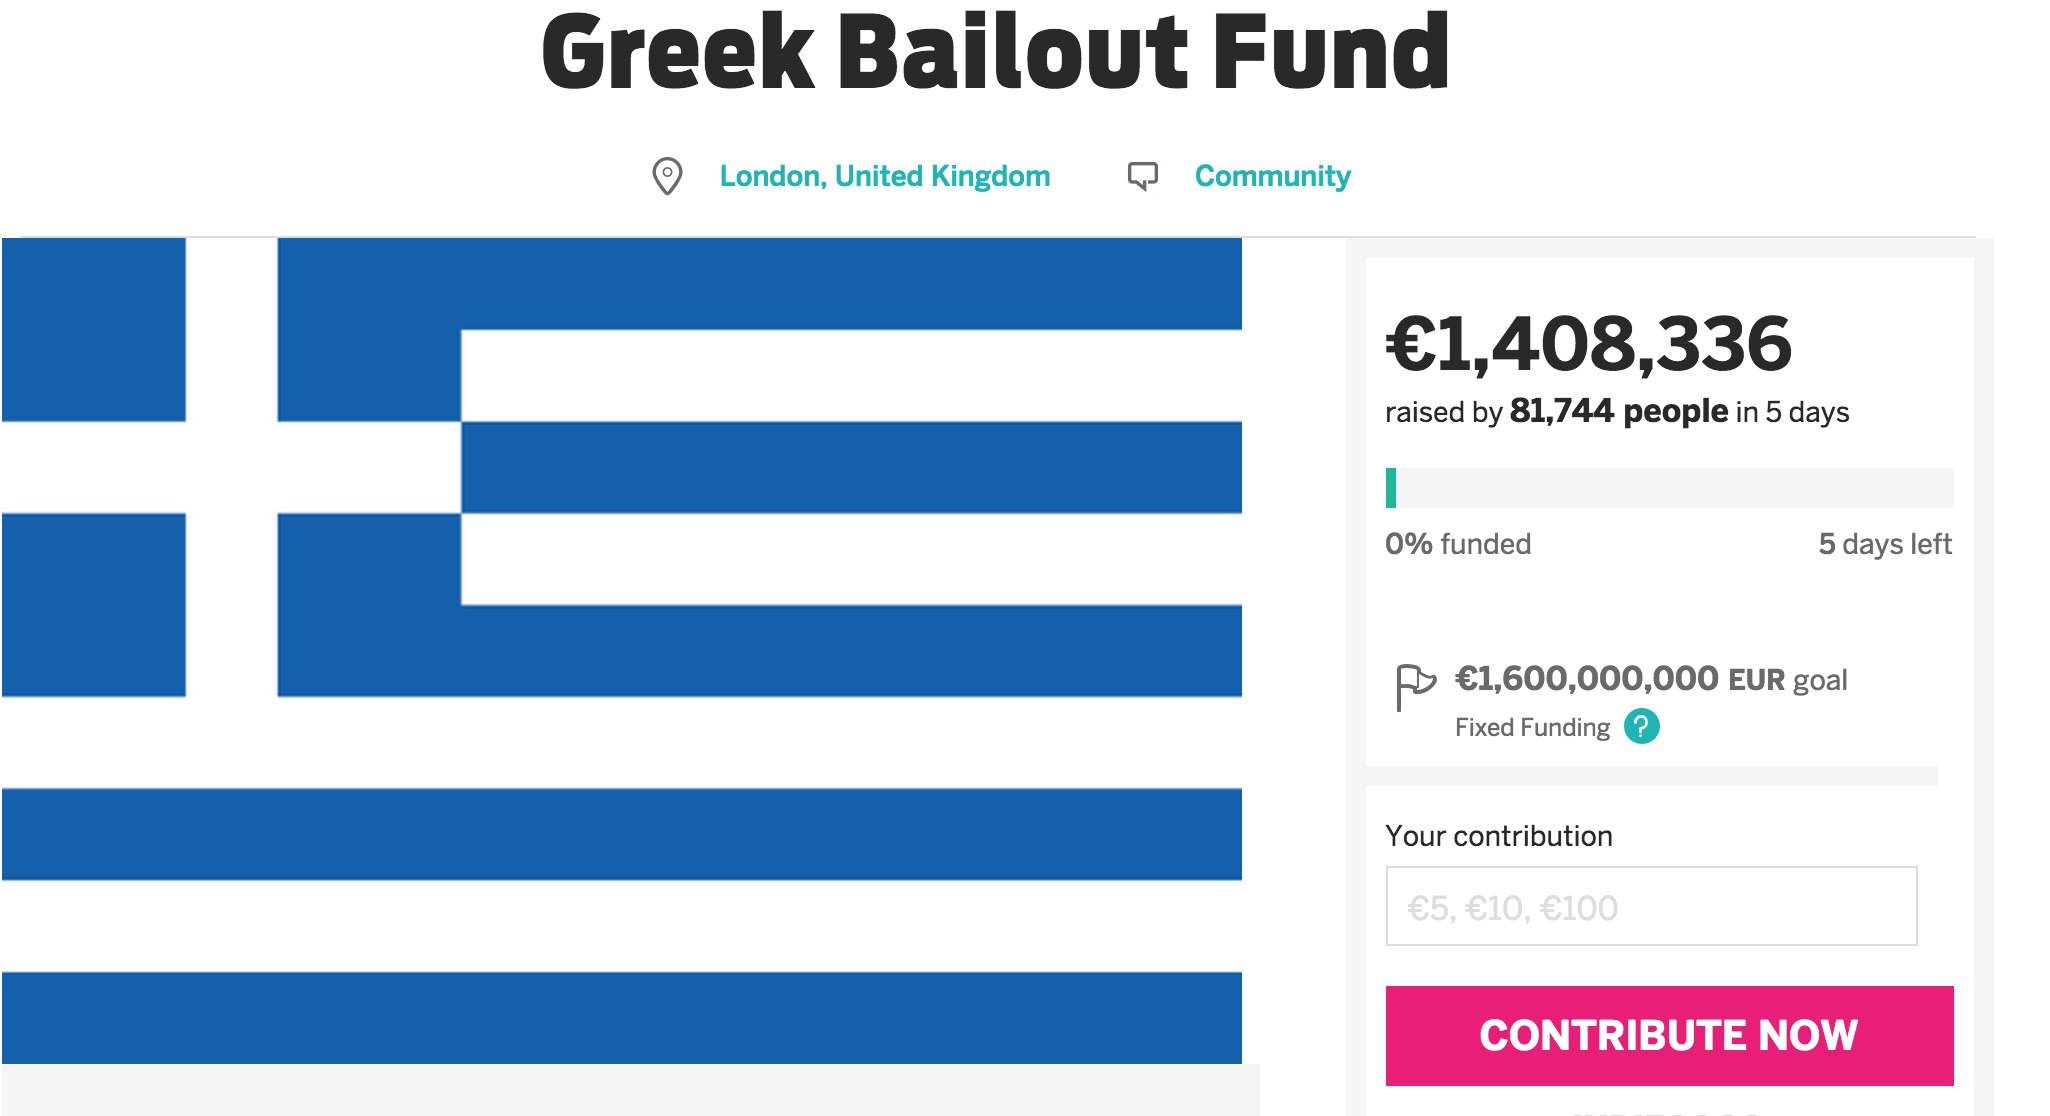 tilestwra.com   Συγκέντρωσε 1.400.000 ευρώ σε 3 ημέρες για την Ελλάδα και συνεχίζει...